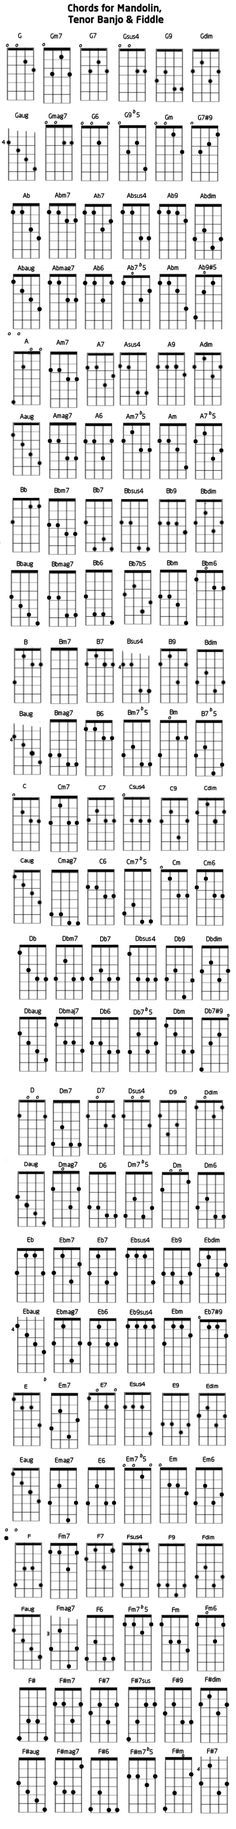 Mandolin Tenor Banjo Chords Pinterest Mandolin Guitars And Banjo